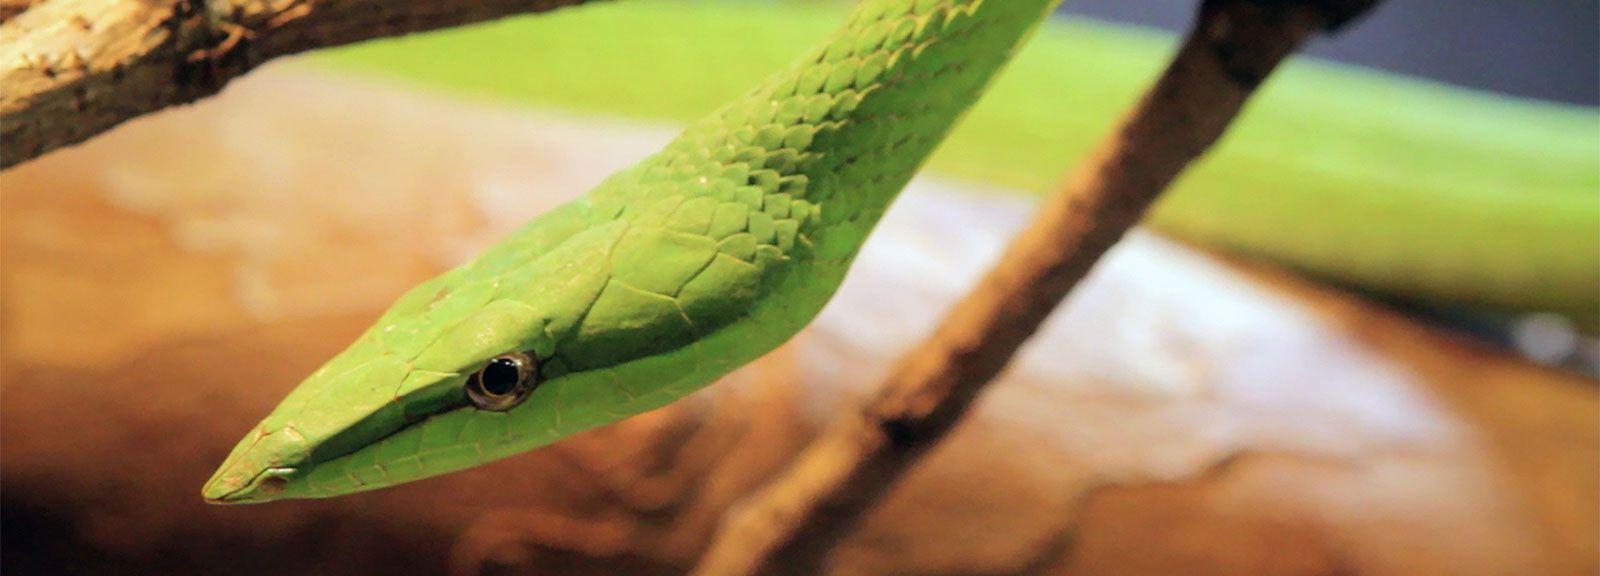 Serpent liane © Charles Rostand